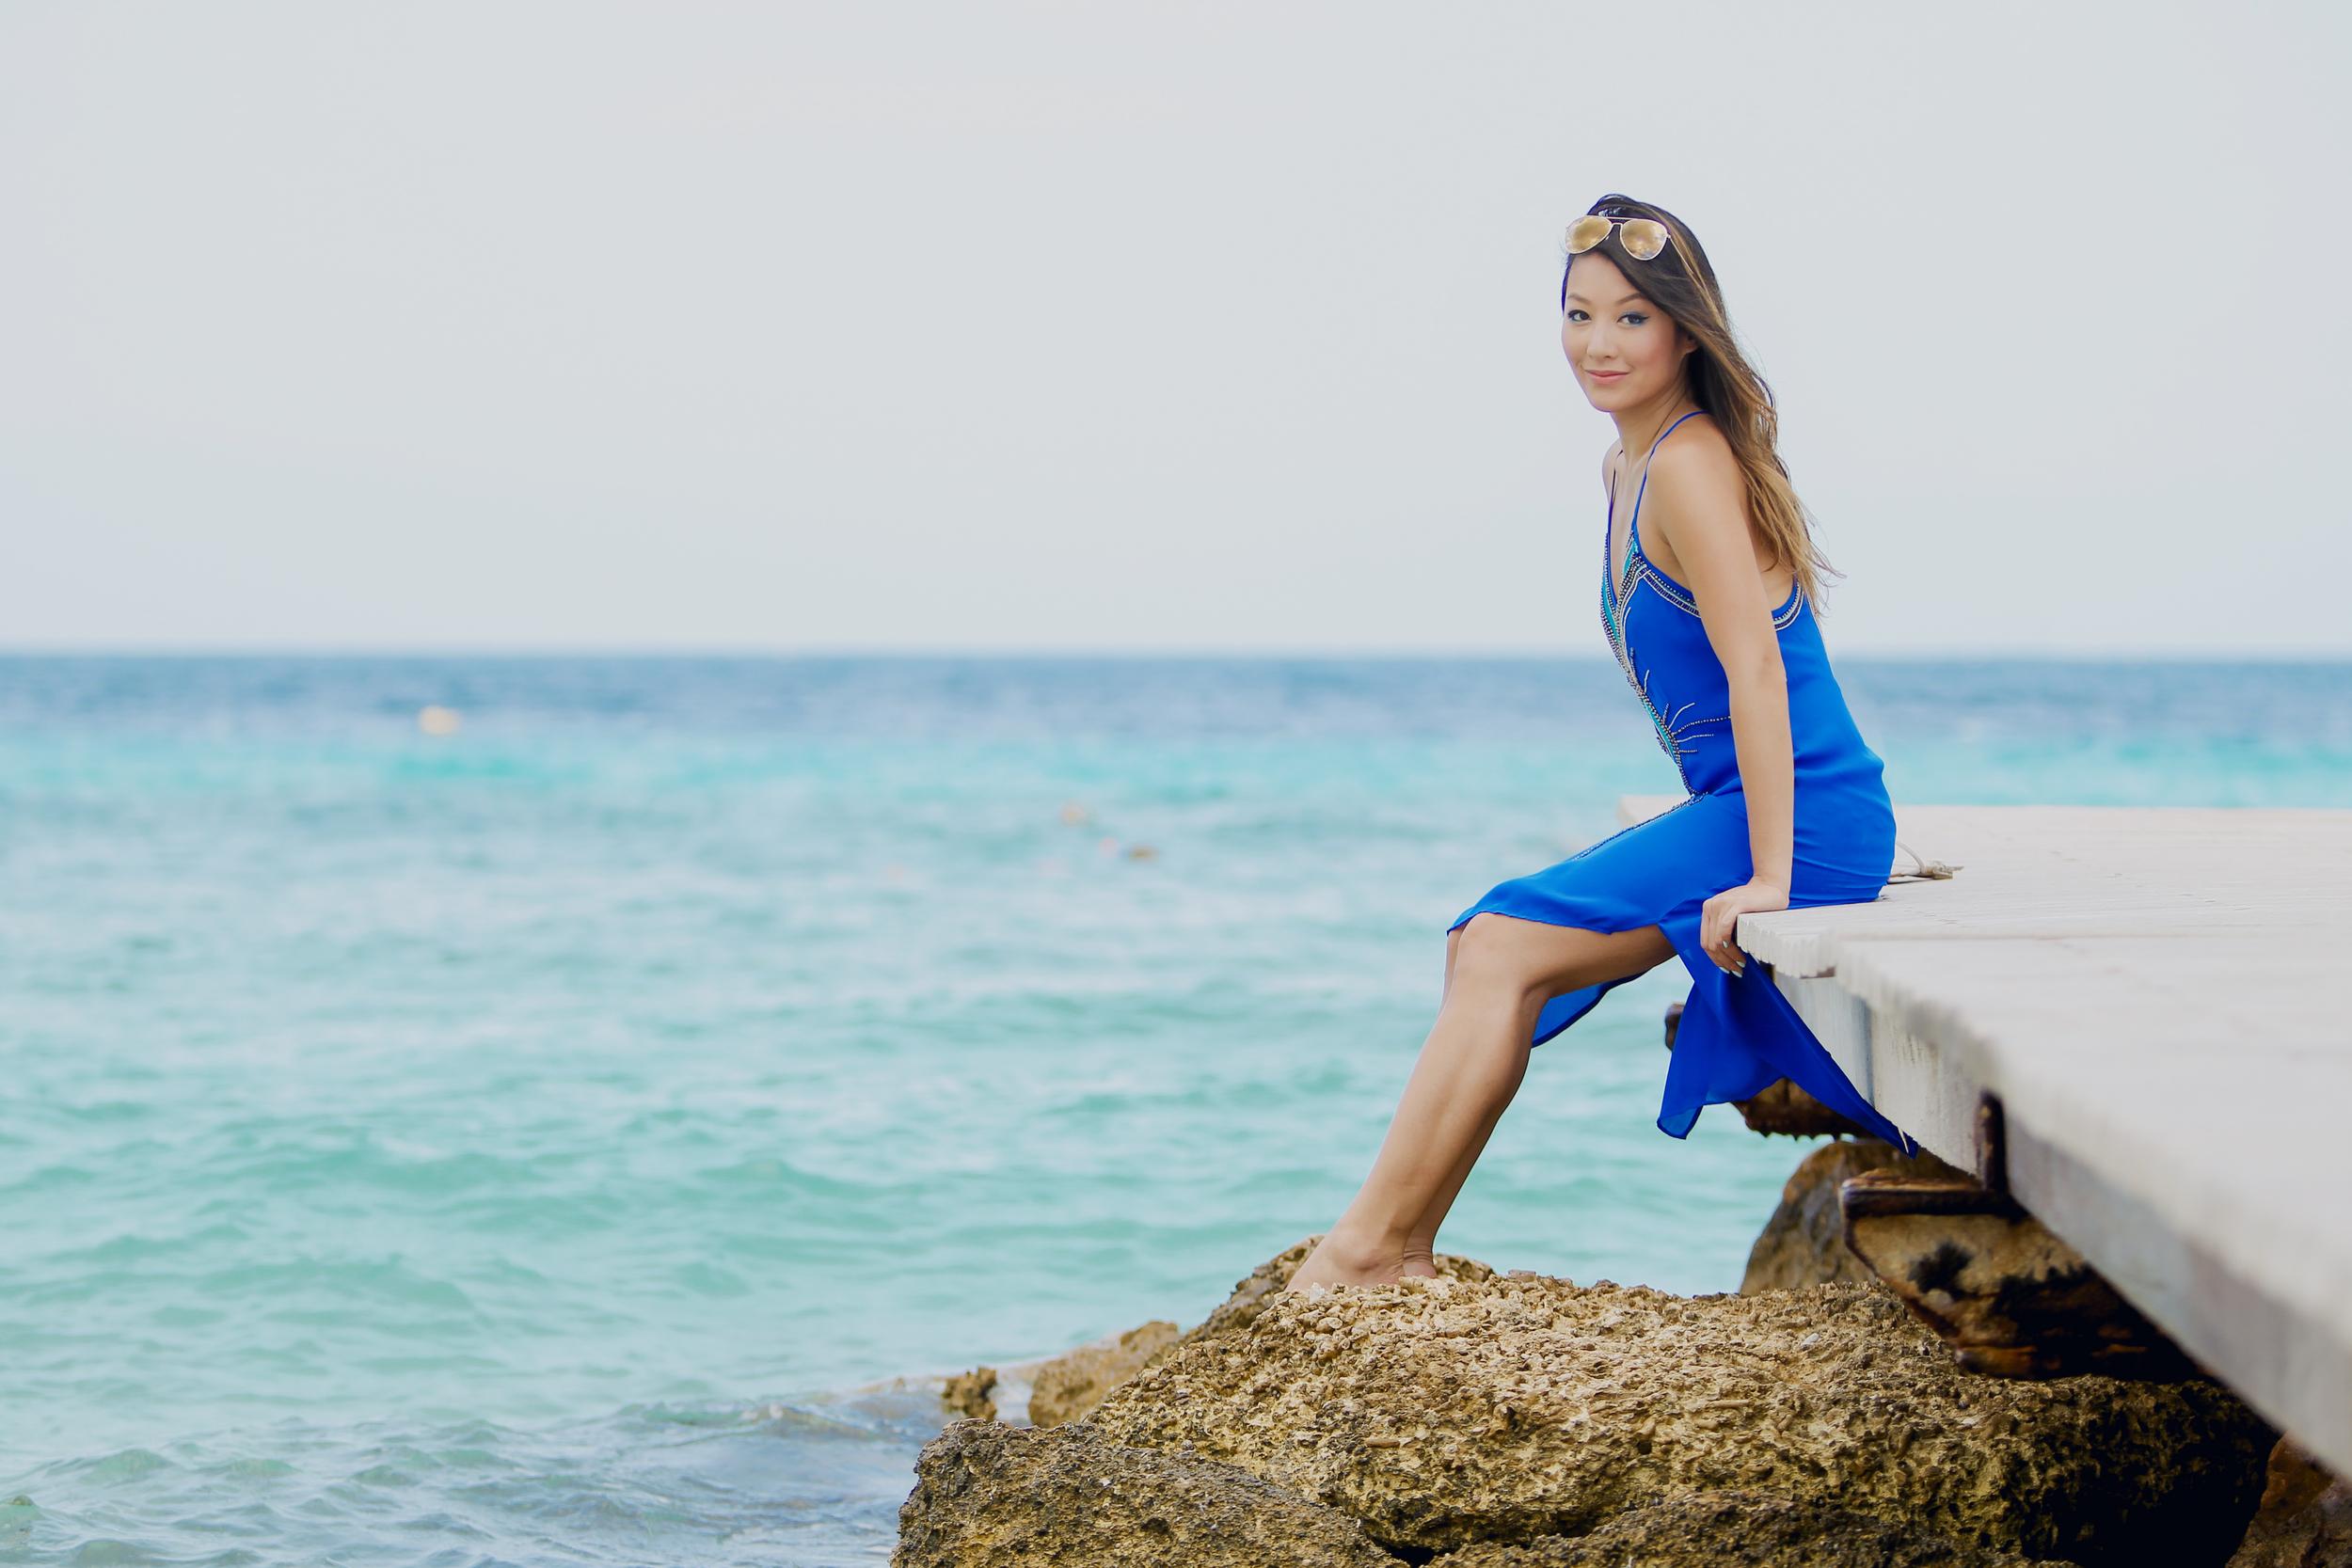 hautehippie_bluedress_beach6.jpg